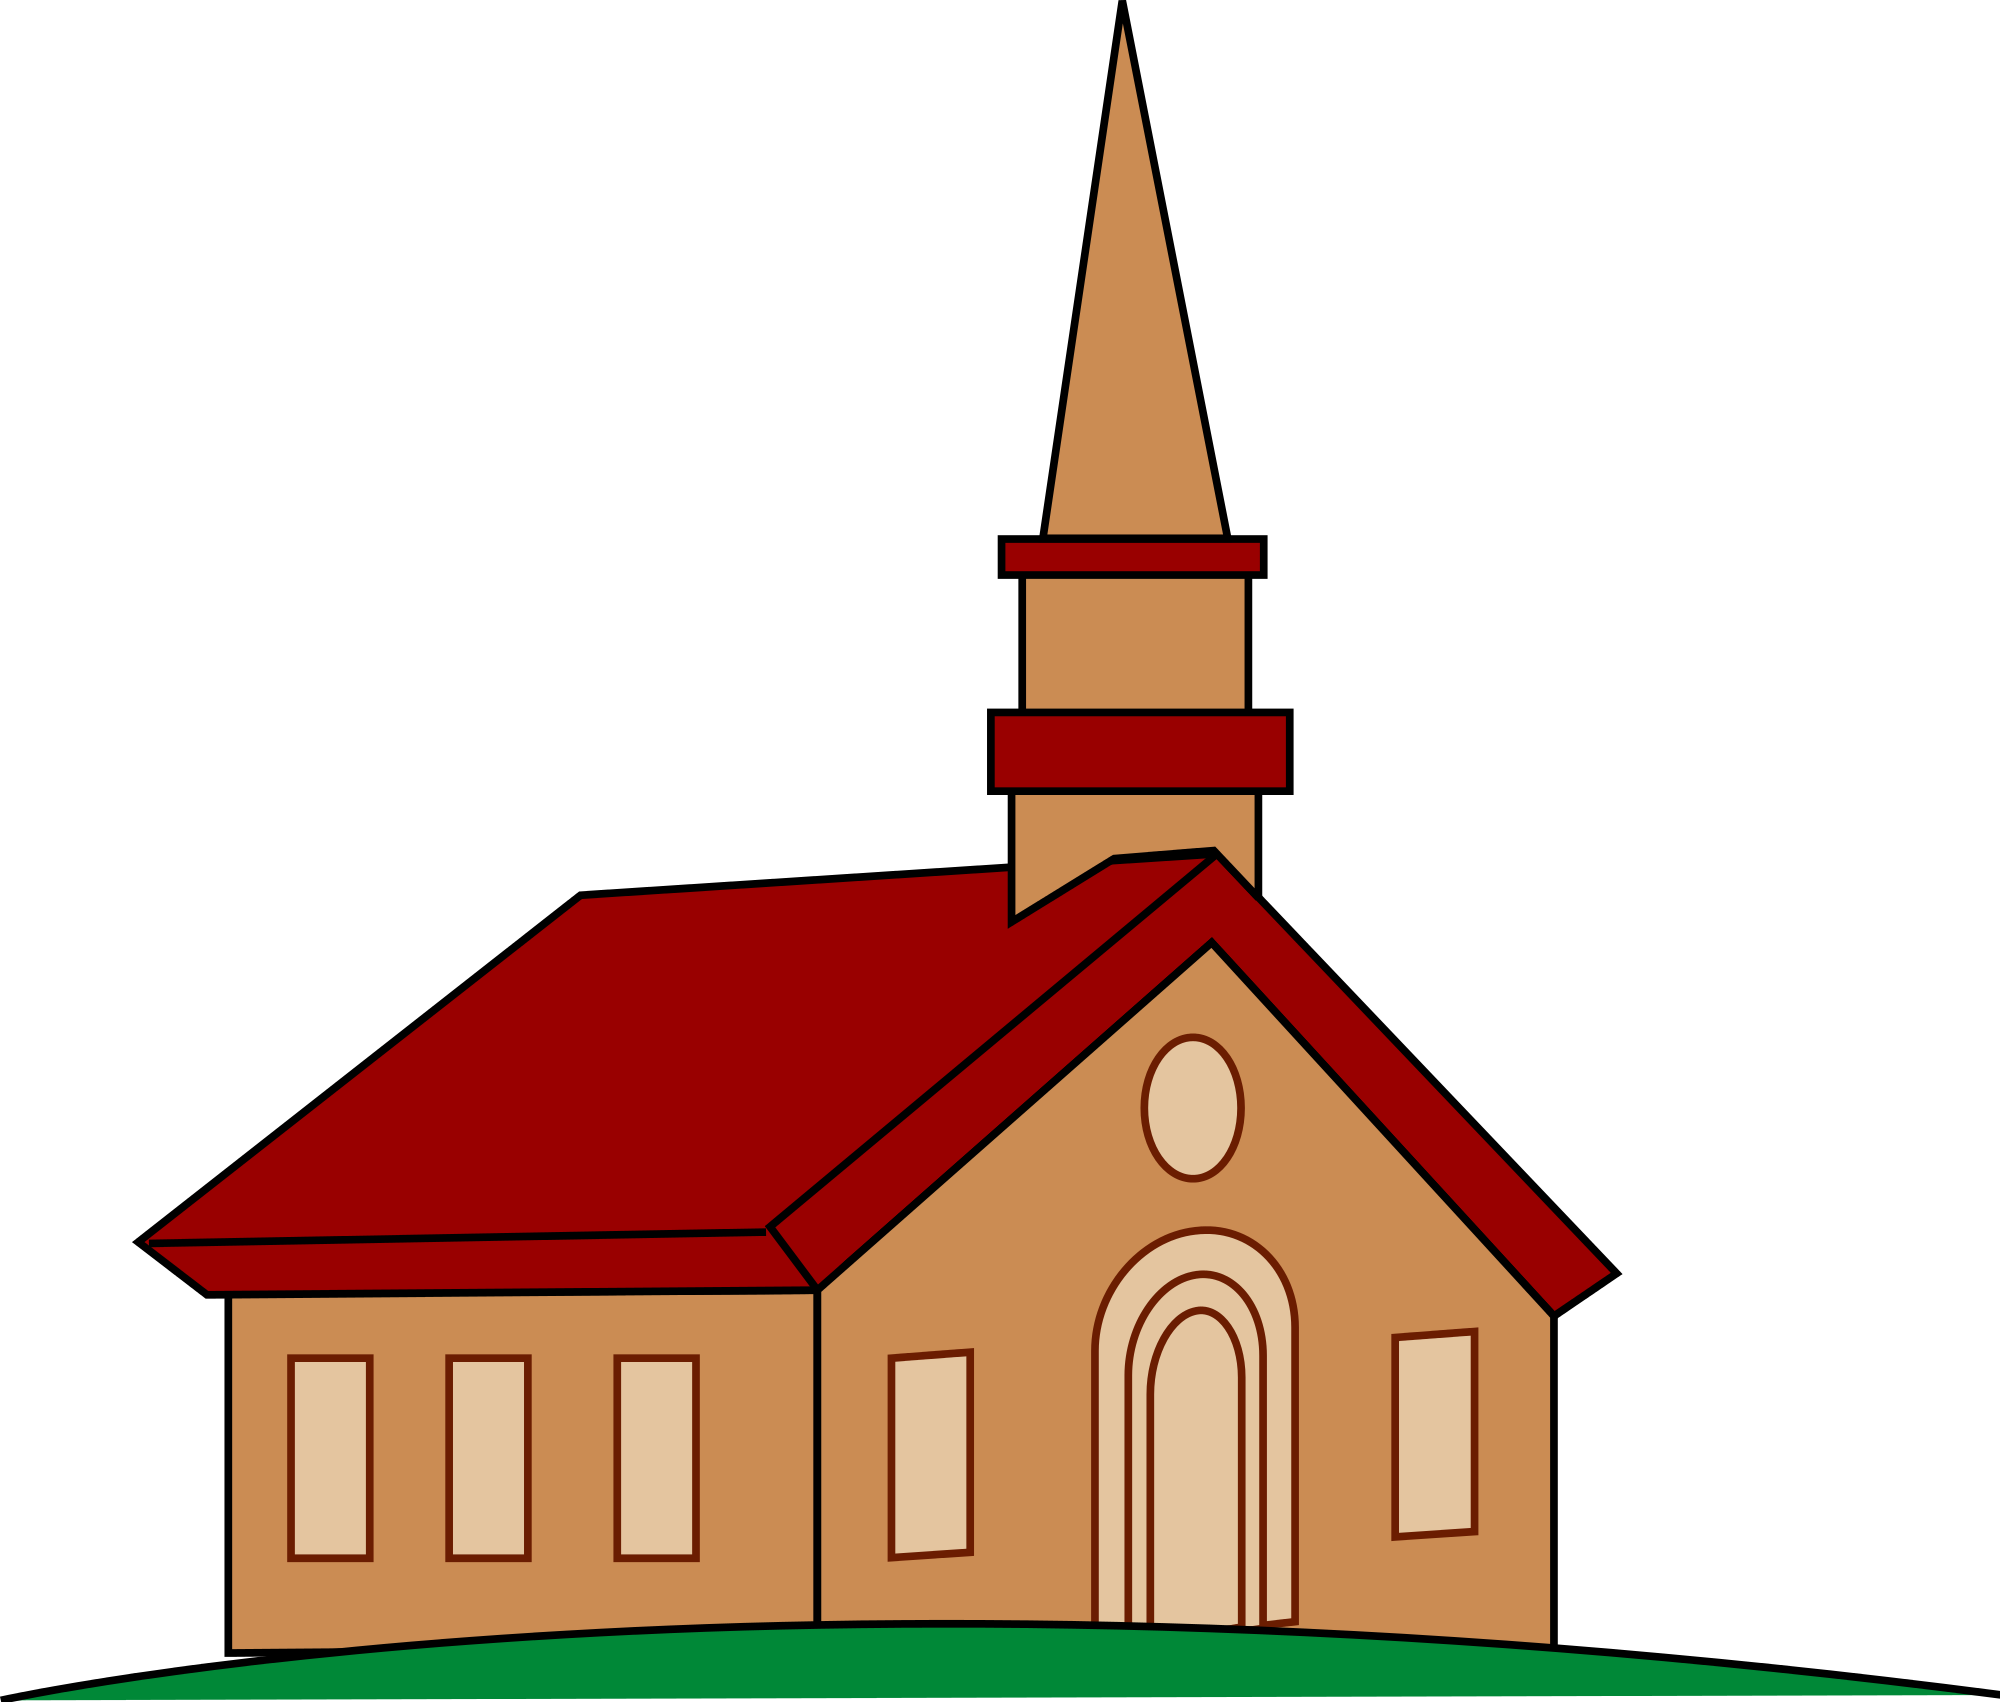 Church silhouette clip art. Lds clipart faith